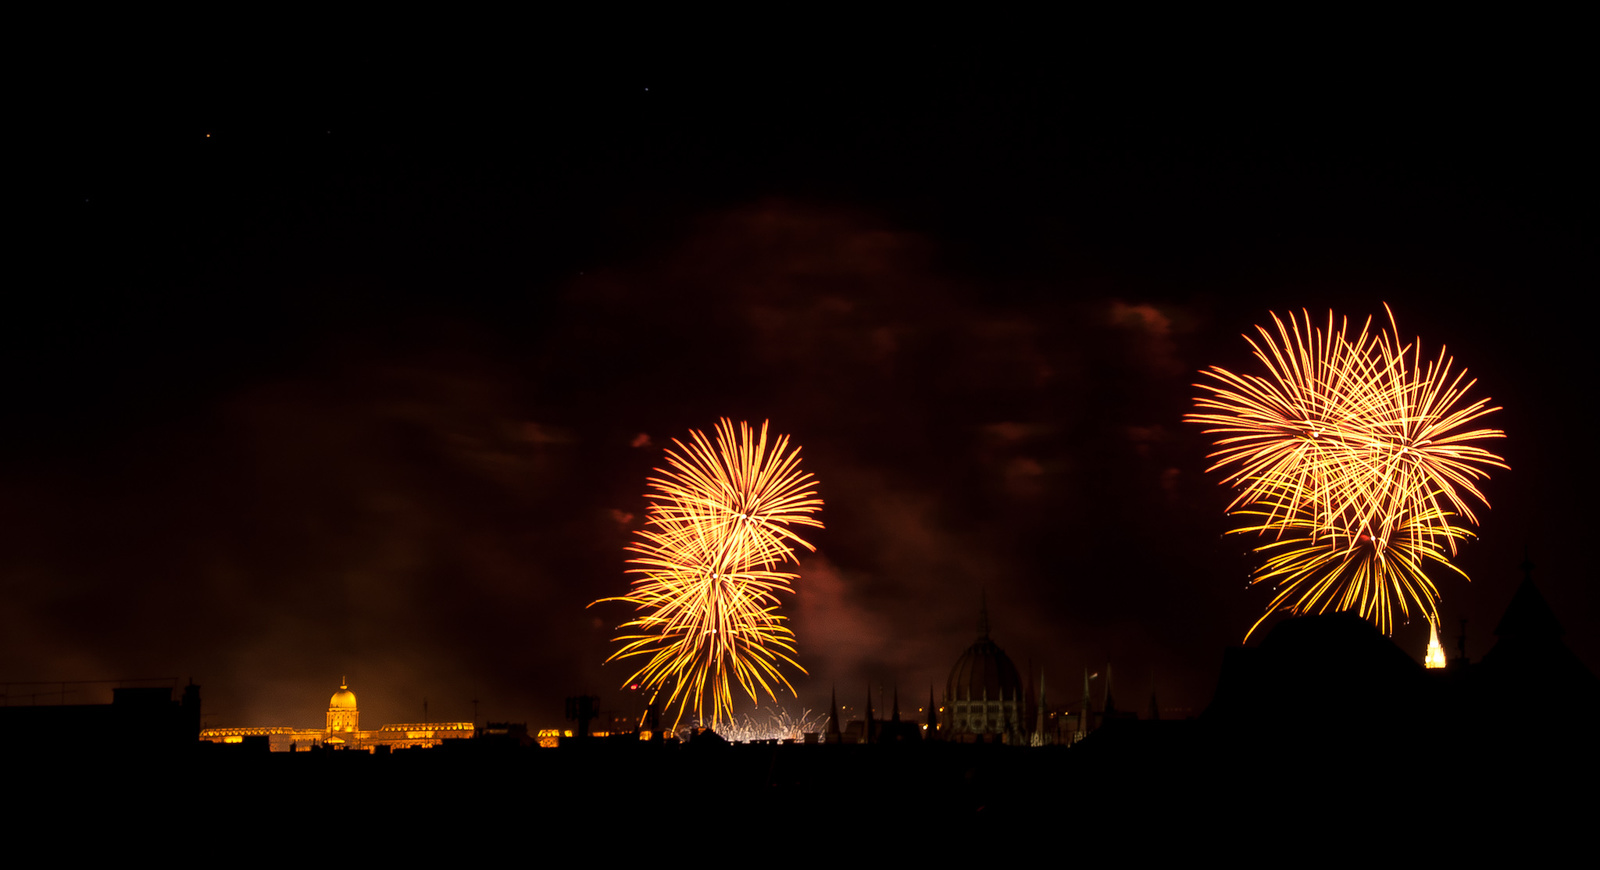 darthwalk: Tűzijáték 2011. augusztus 20.-6